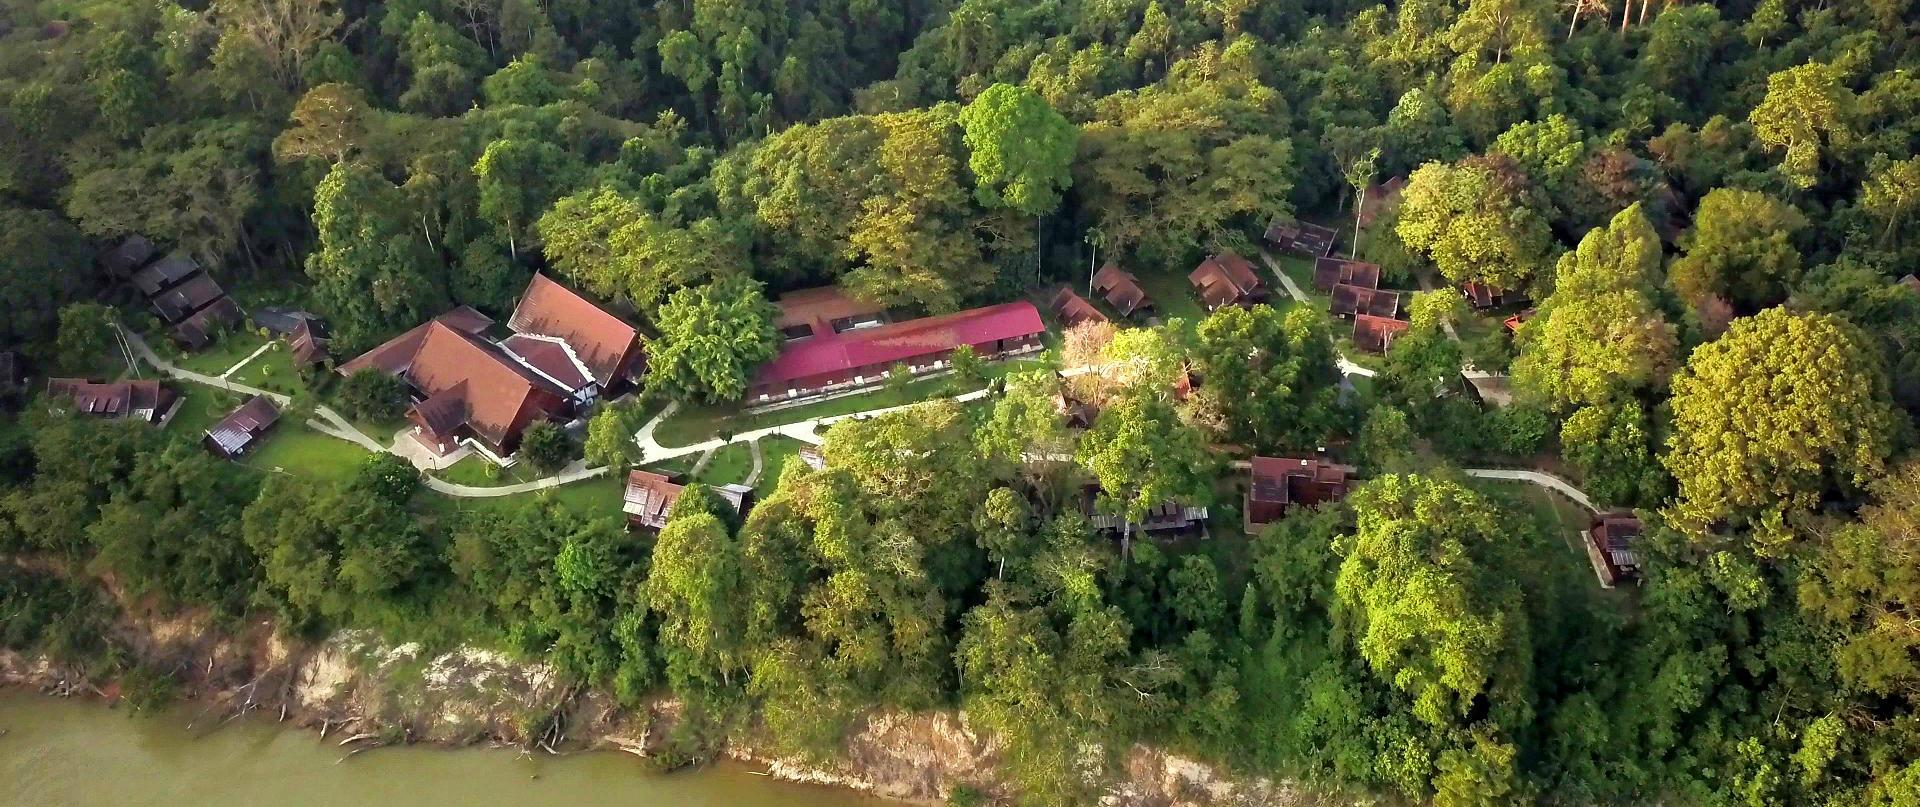 Mutiara Taman Negara Hotel, Jerantut